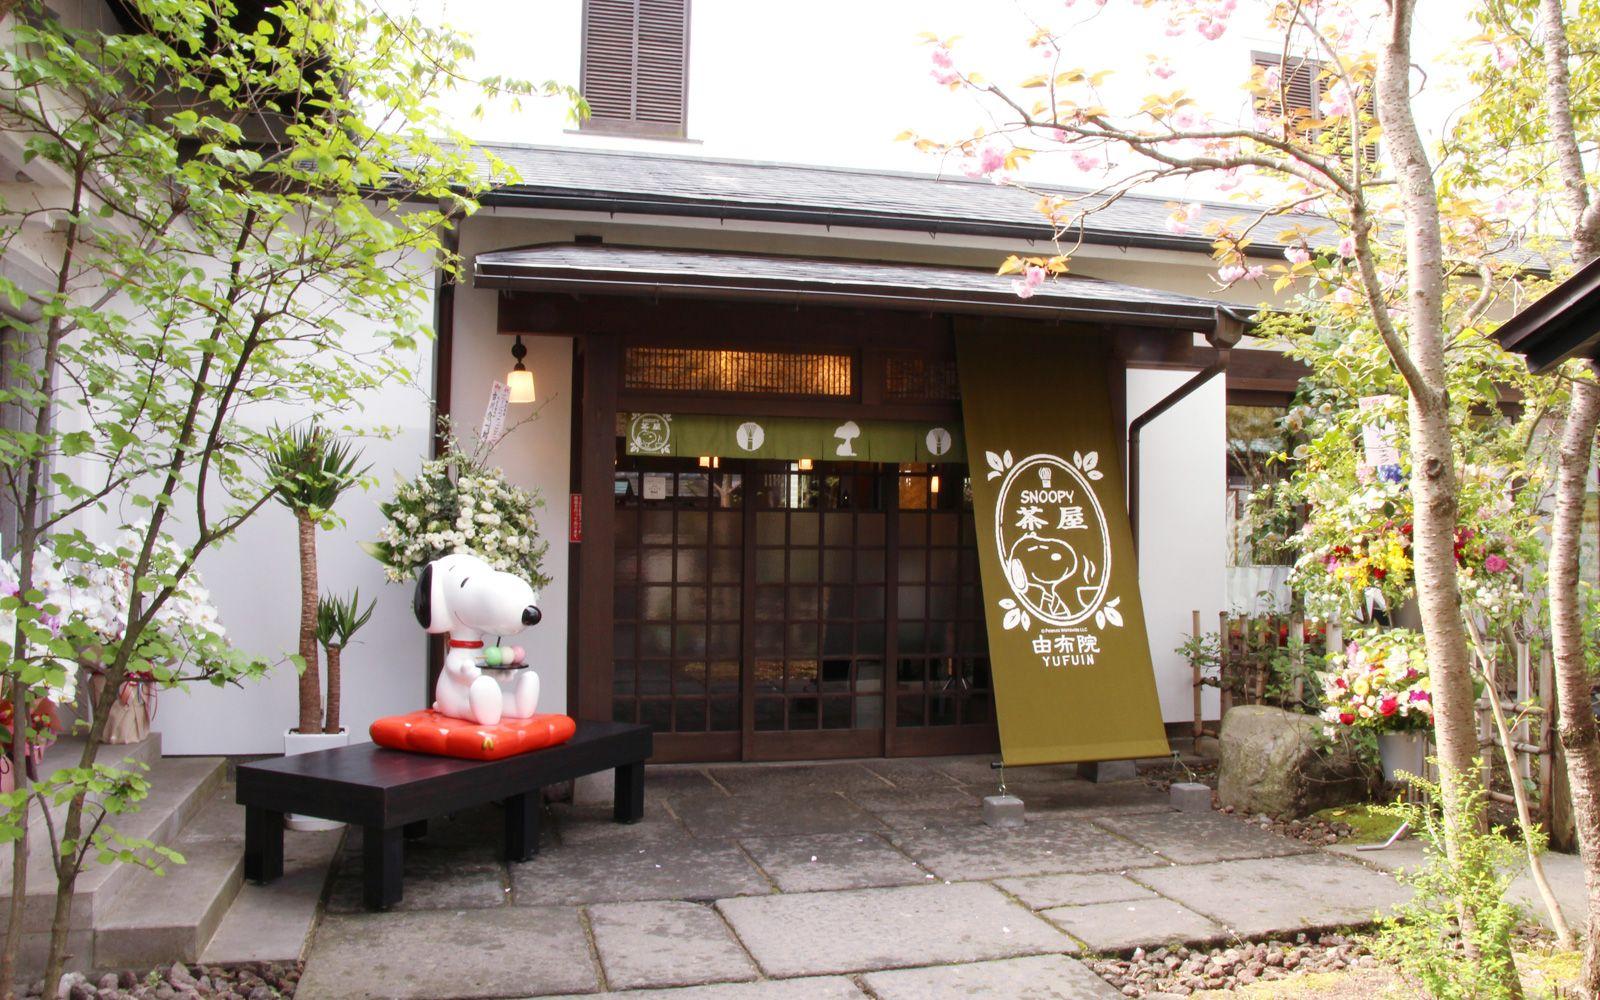 Snoopy Tea House, Yufuin